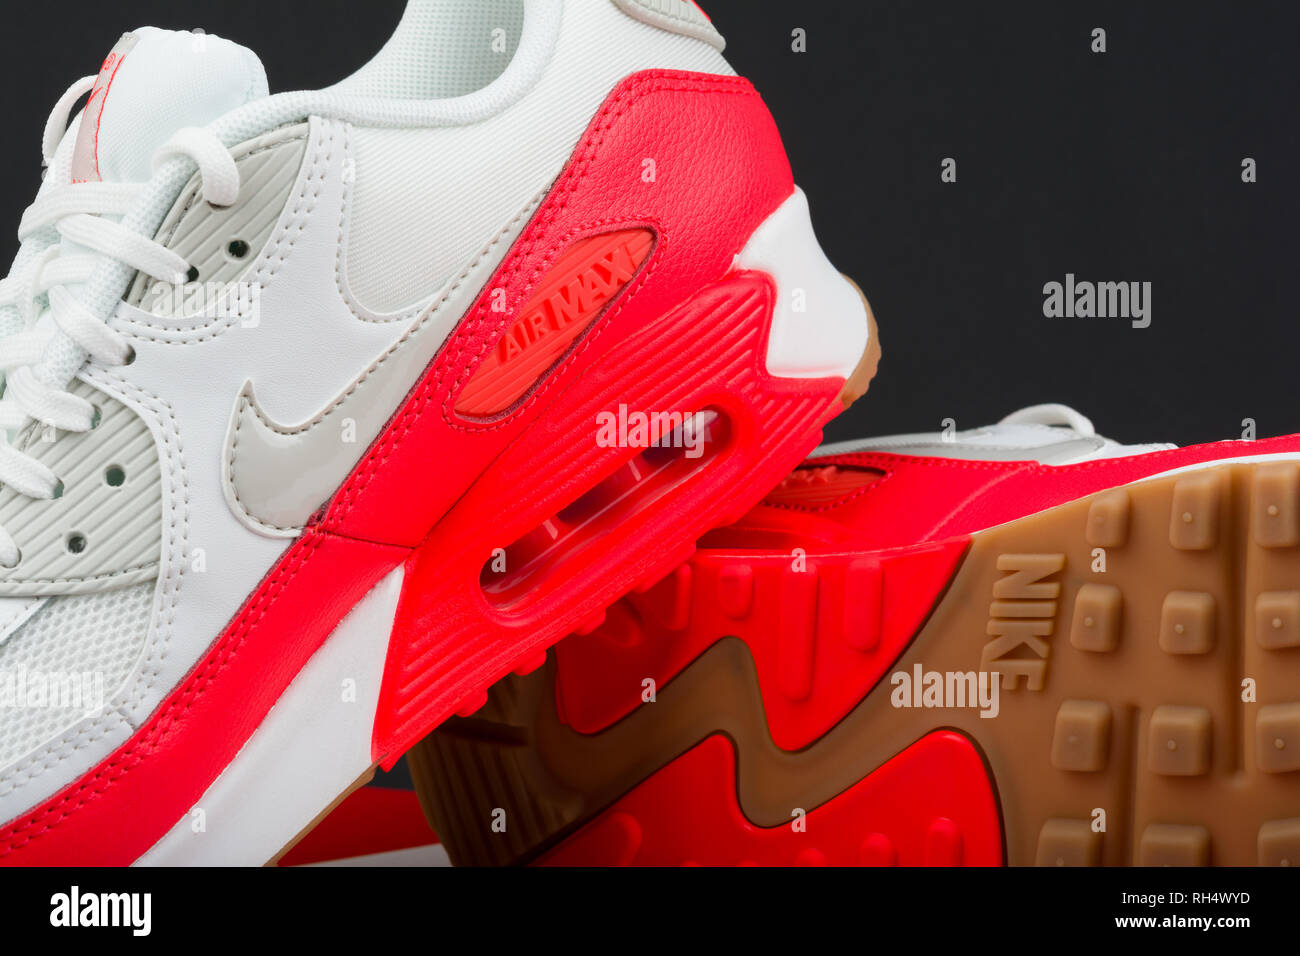 Nike Air Max Sneakers Immagini e Fotos Stock Alamy